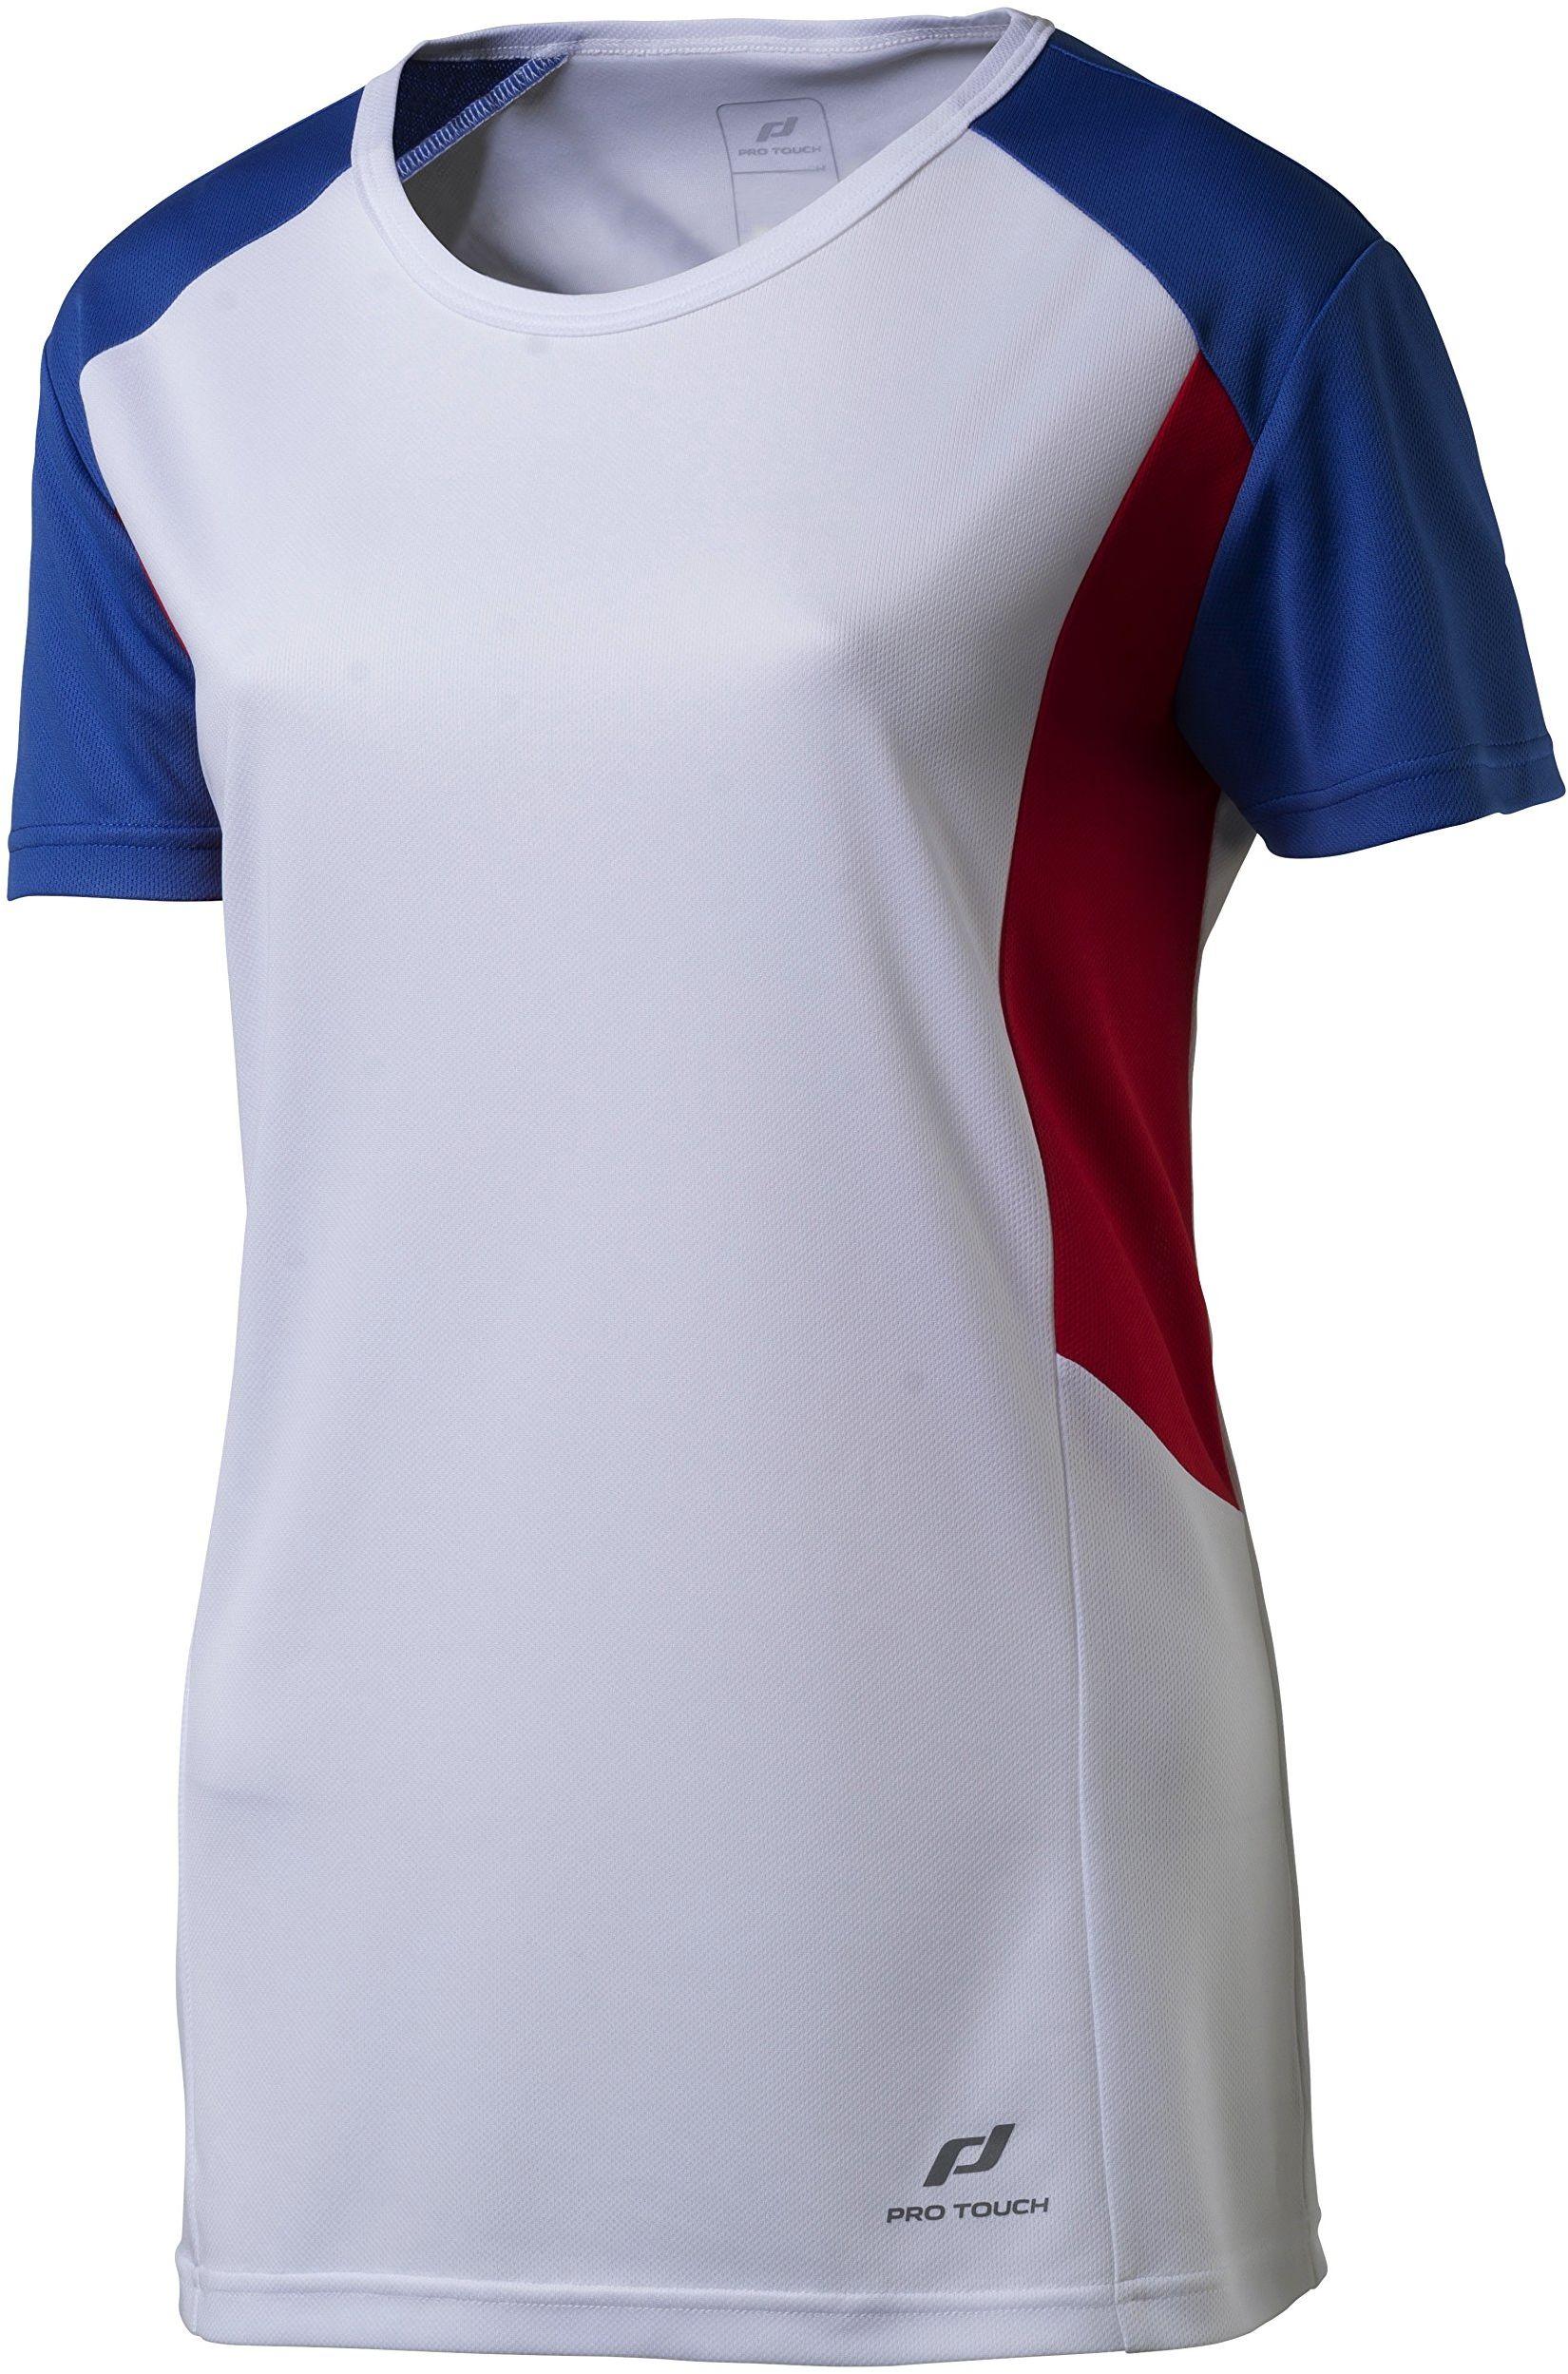 Pro Touch Cup T-shirt, biały, 40